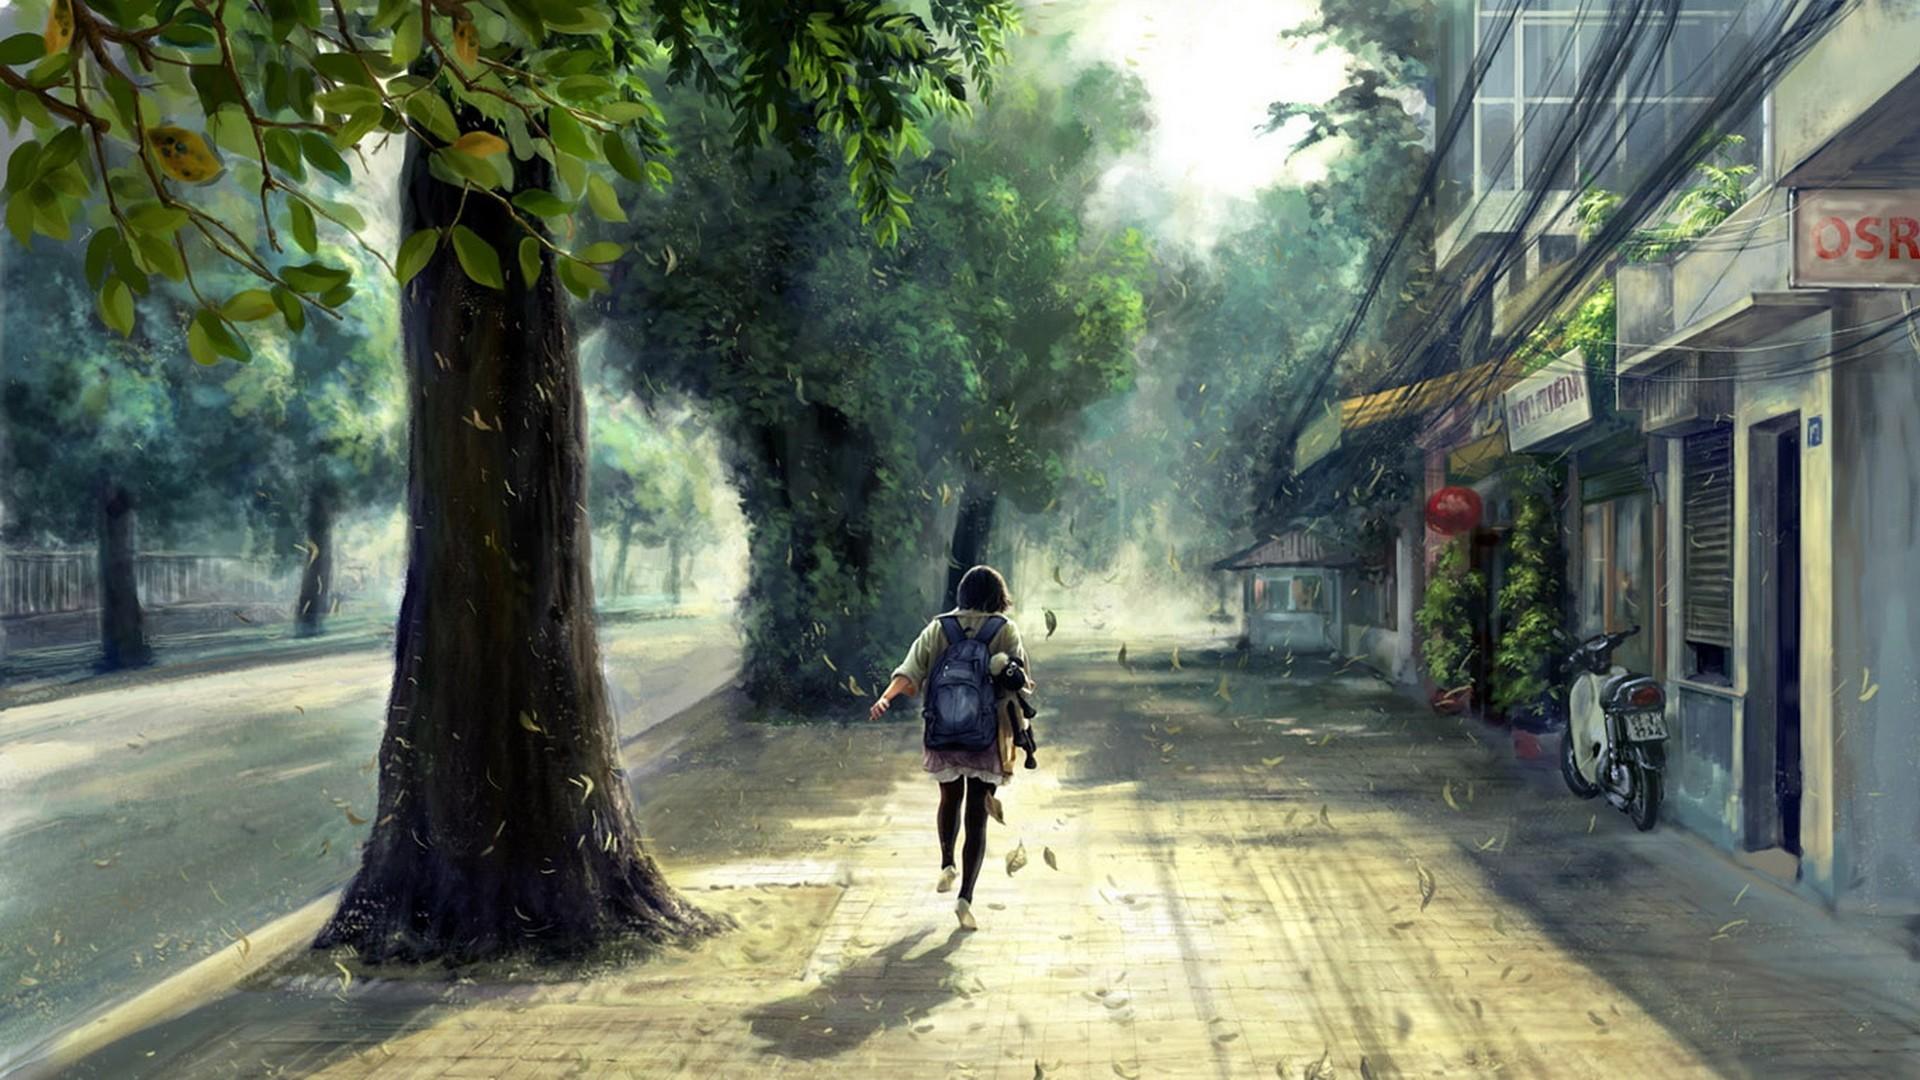 Wallpaper Anime Scenery x